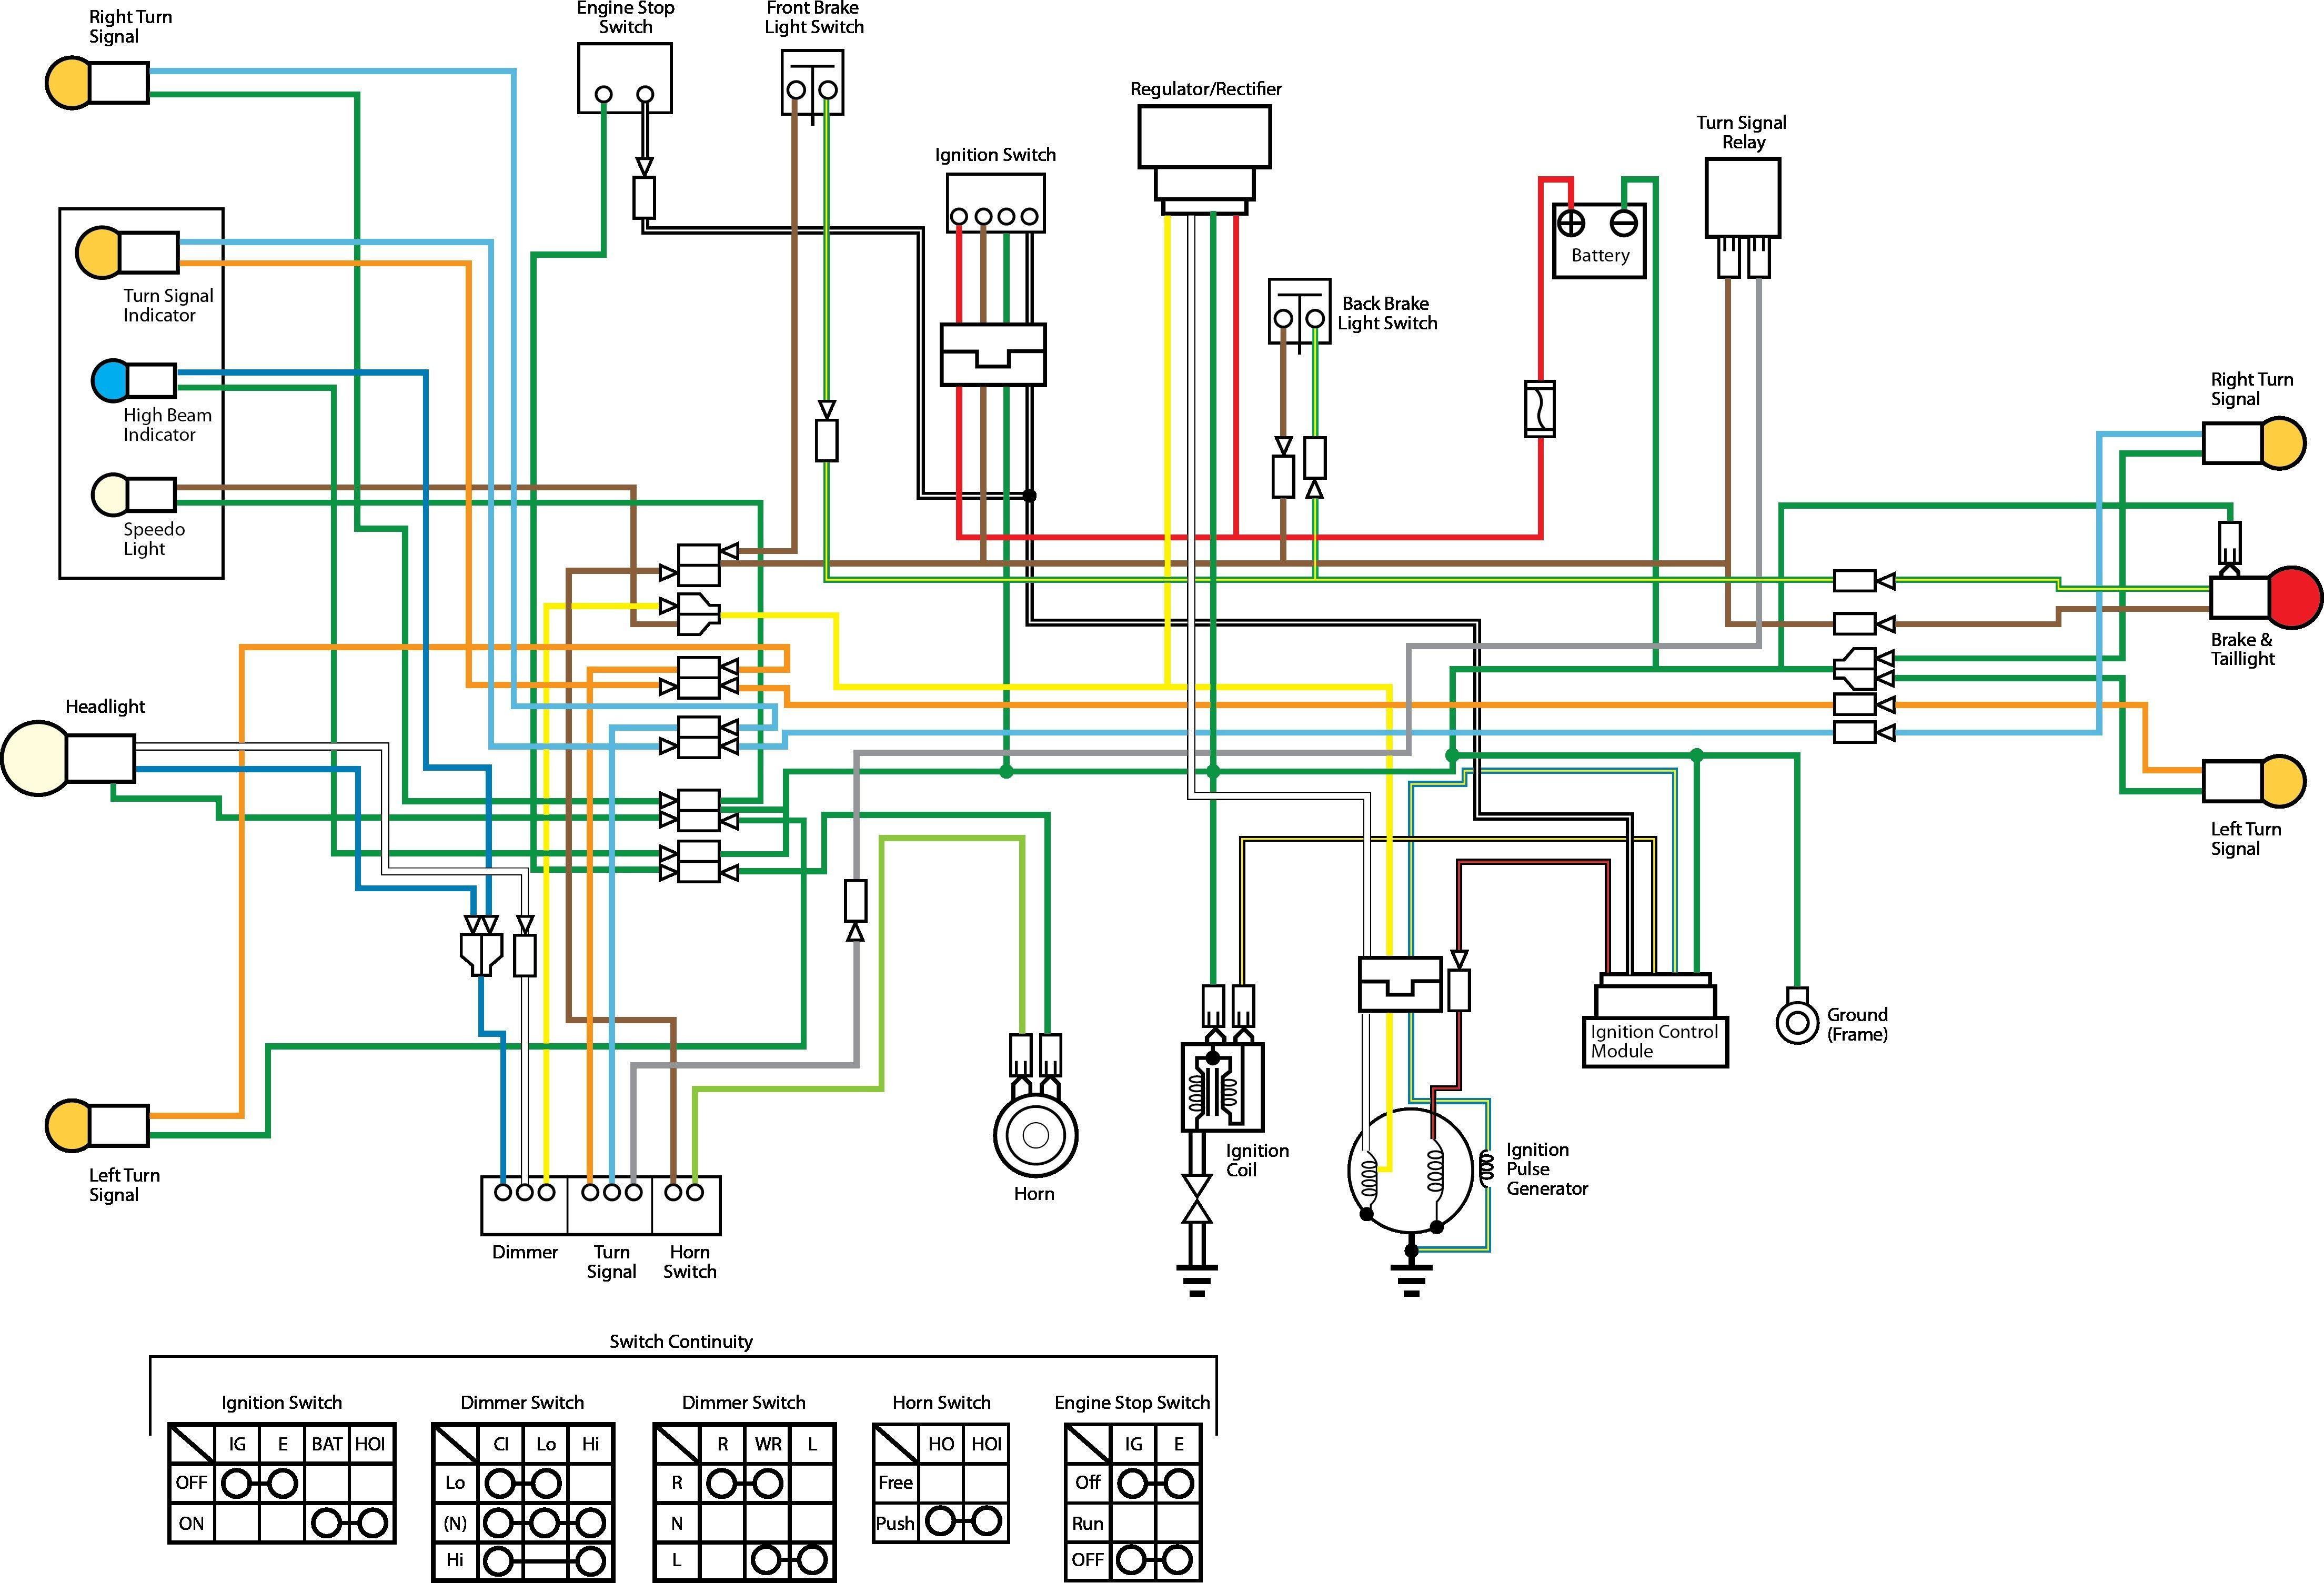 Unique Volkswagen Generator Wiring Diagram Diagram Diagramsample Diagramtemplate Wiringdiagr Motorcycle Wiring Electrical Wiring Diagram Electrical Diagram